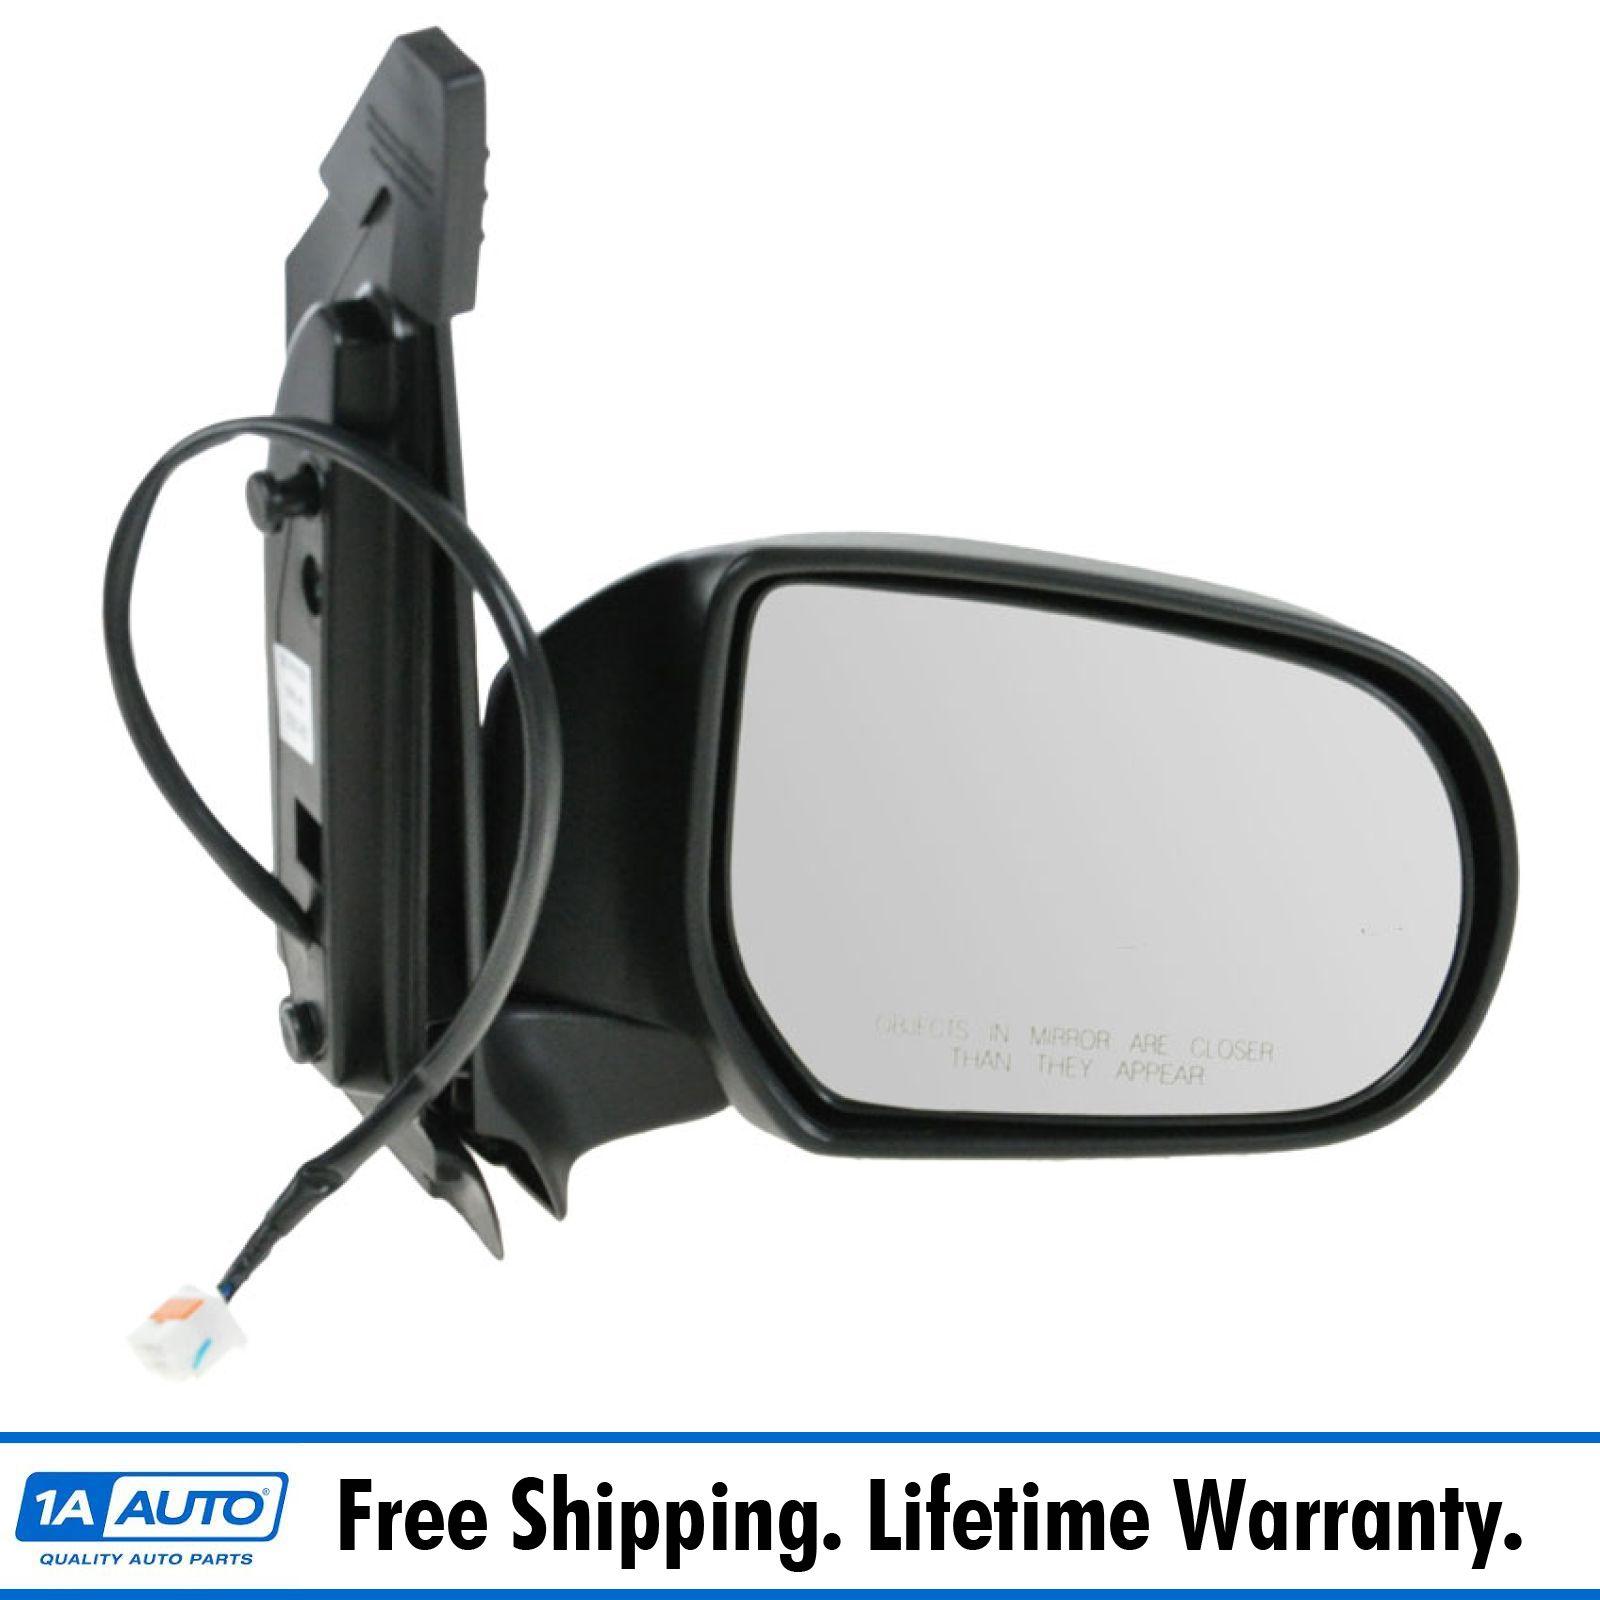 00-06 Mazda MPV Van Power Heated Folding Black Rear View Mirror Left Driver Side